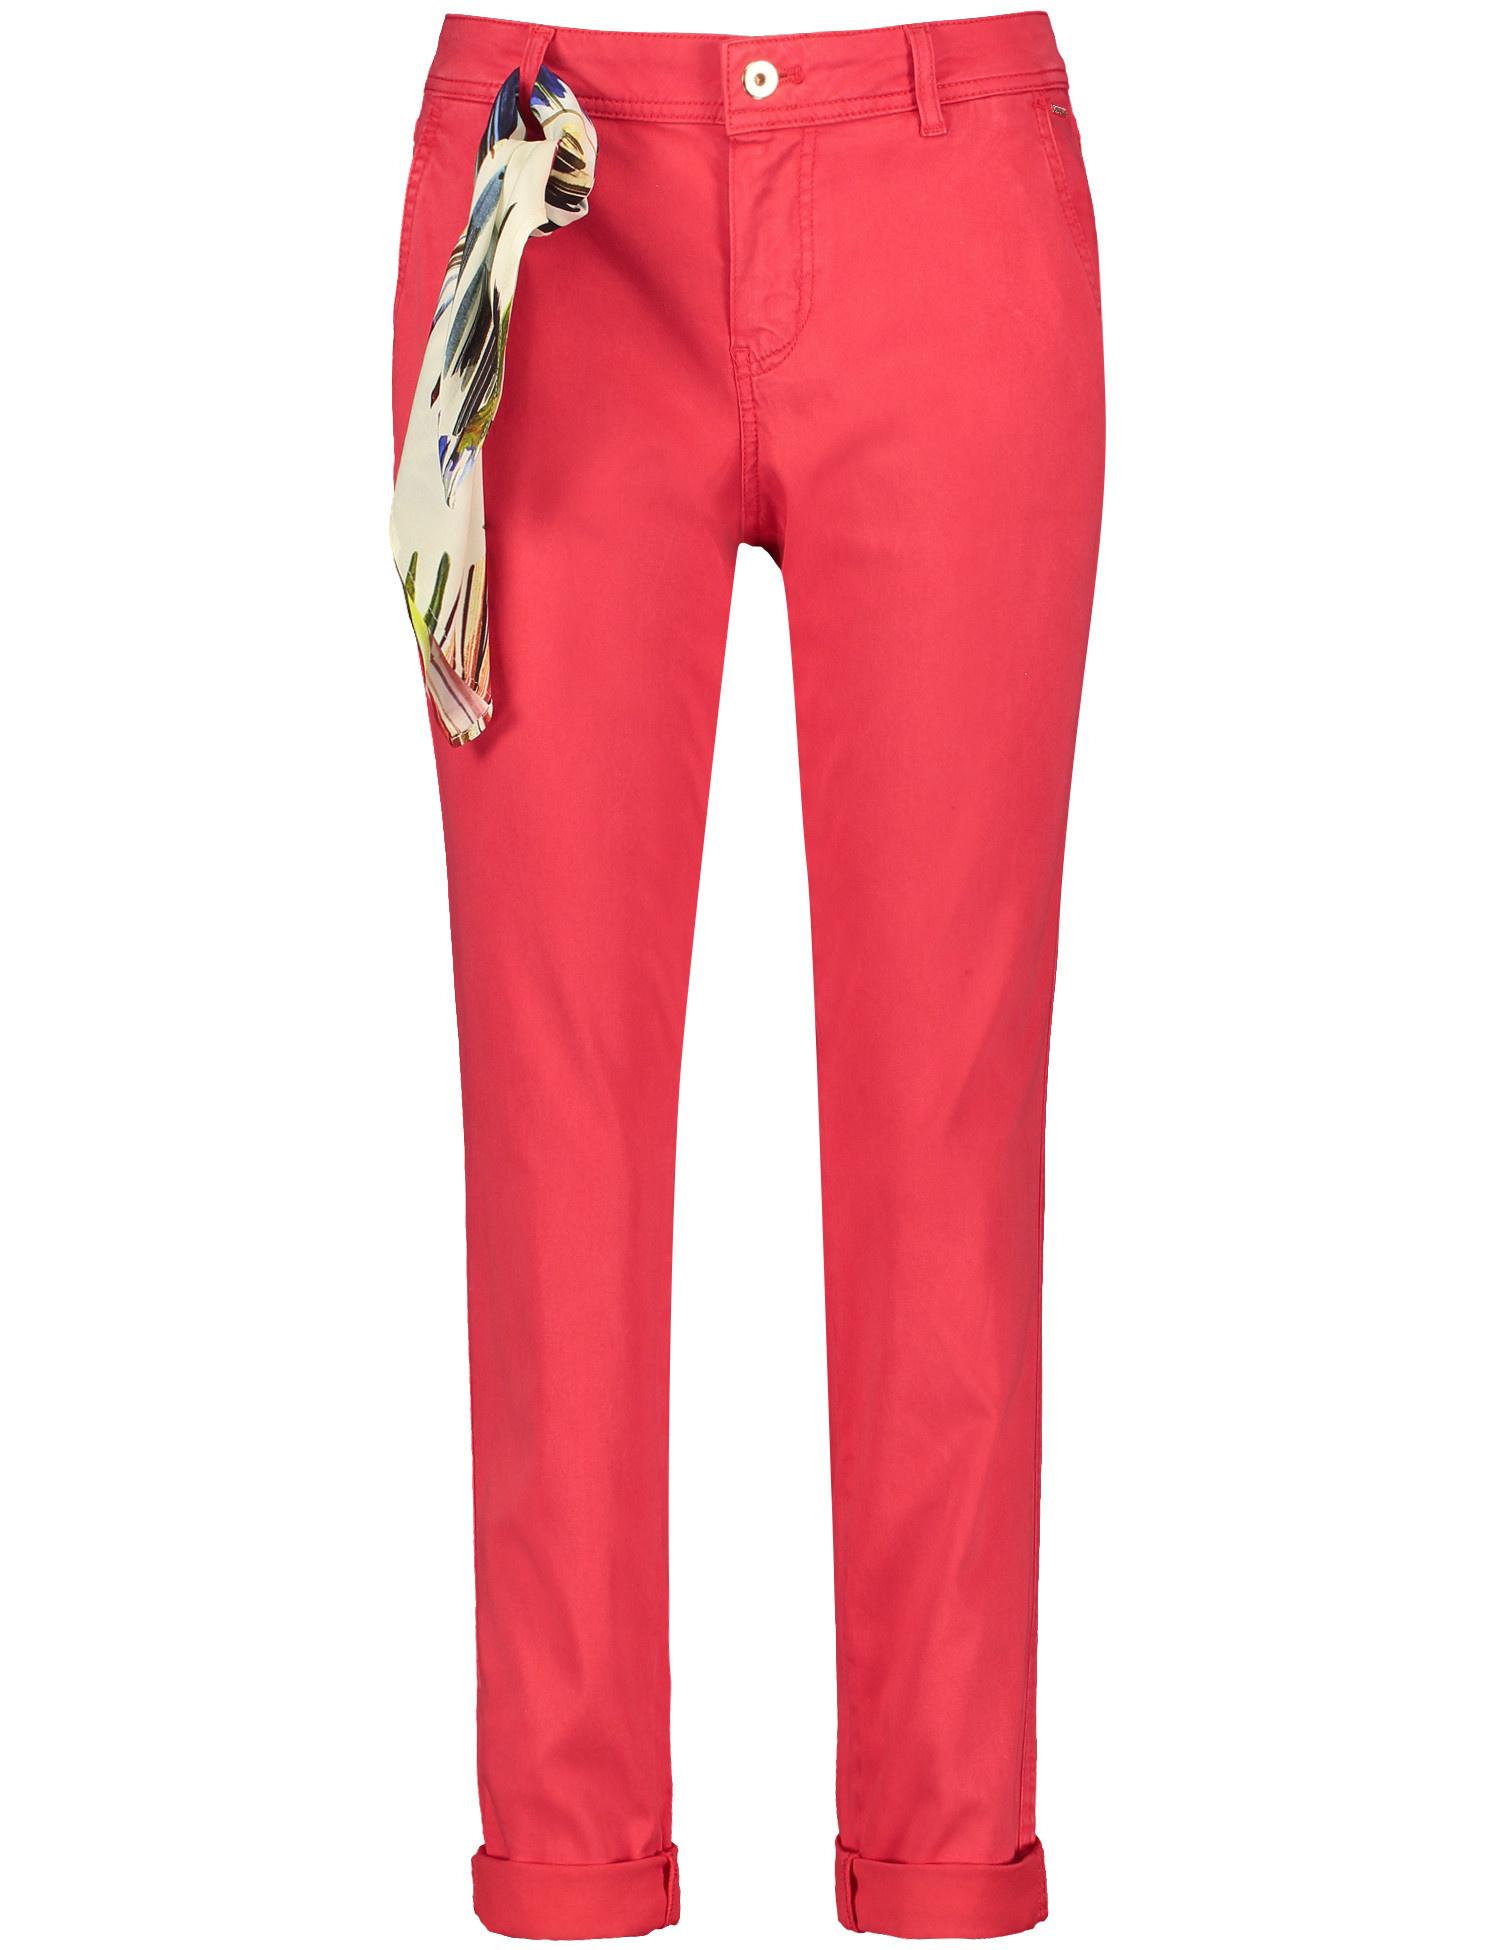 TAIFUN pantalon chino-4